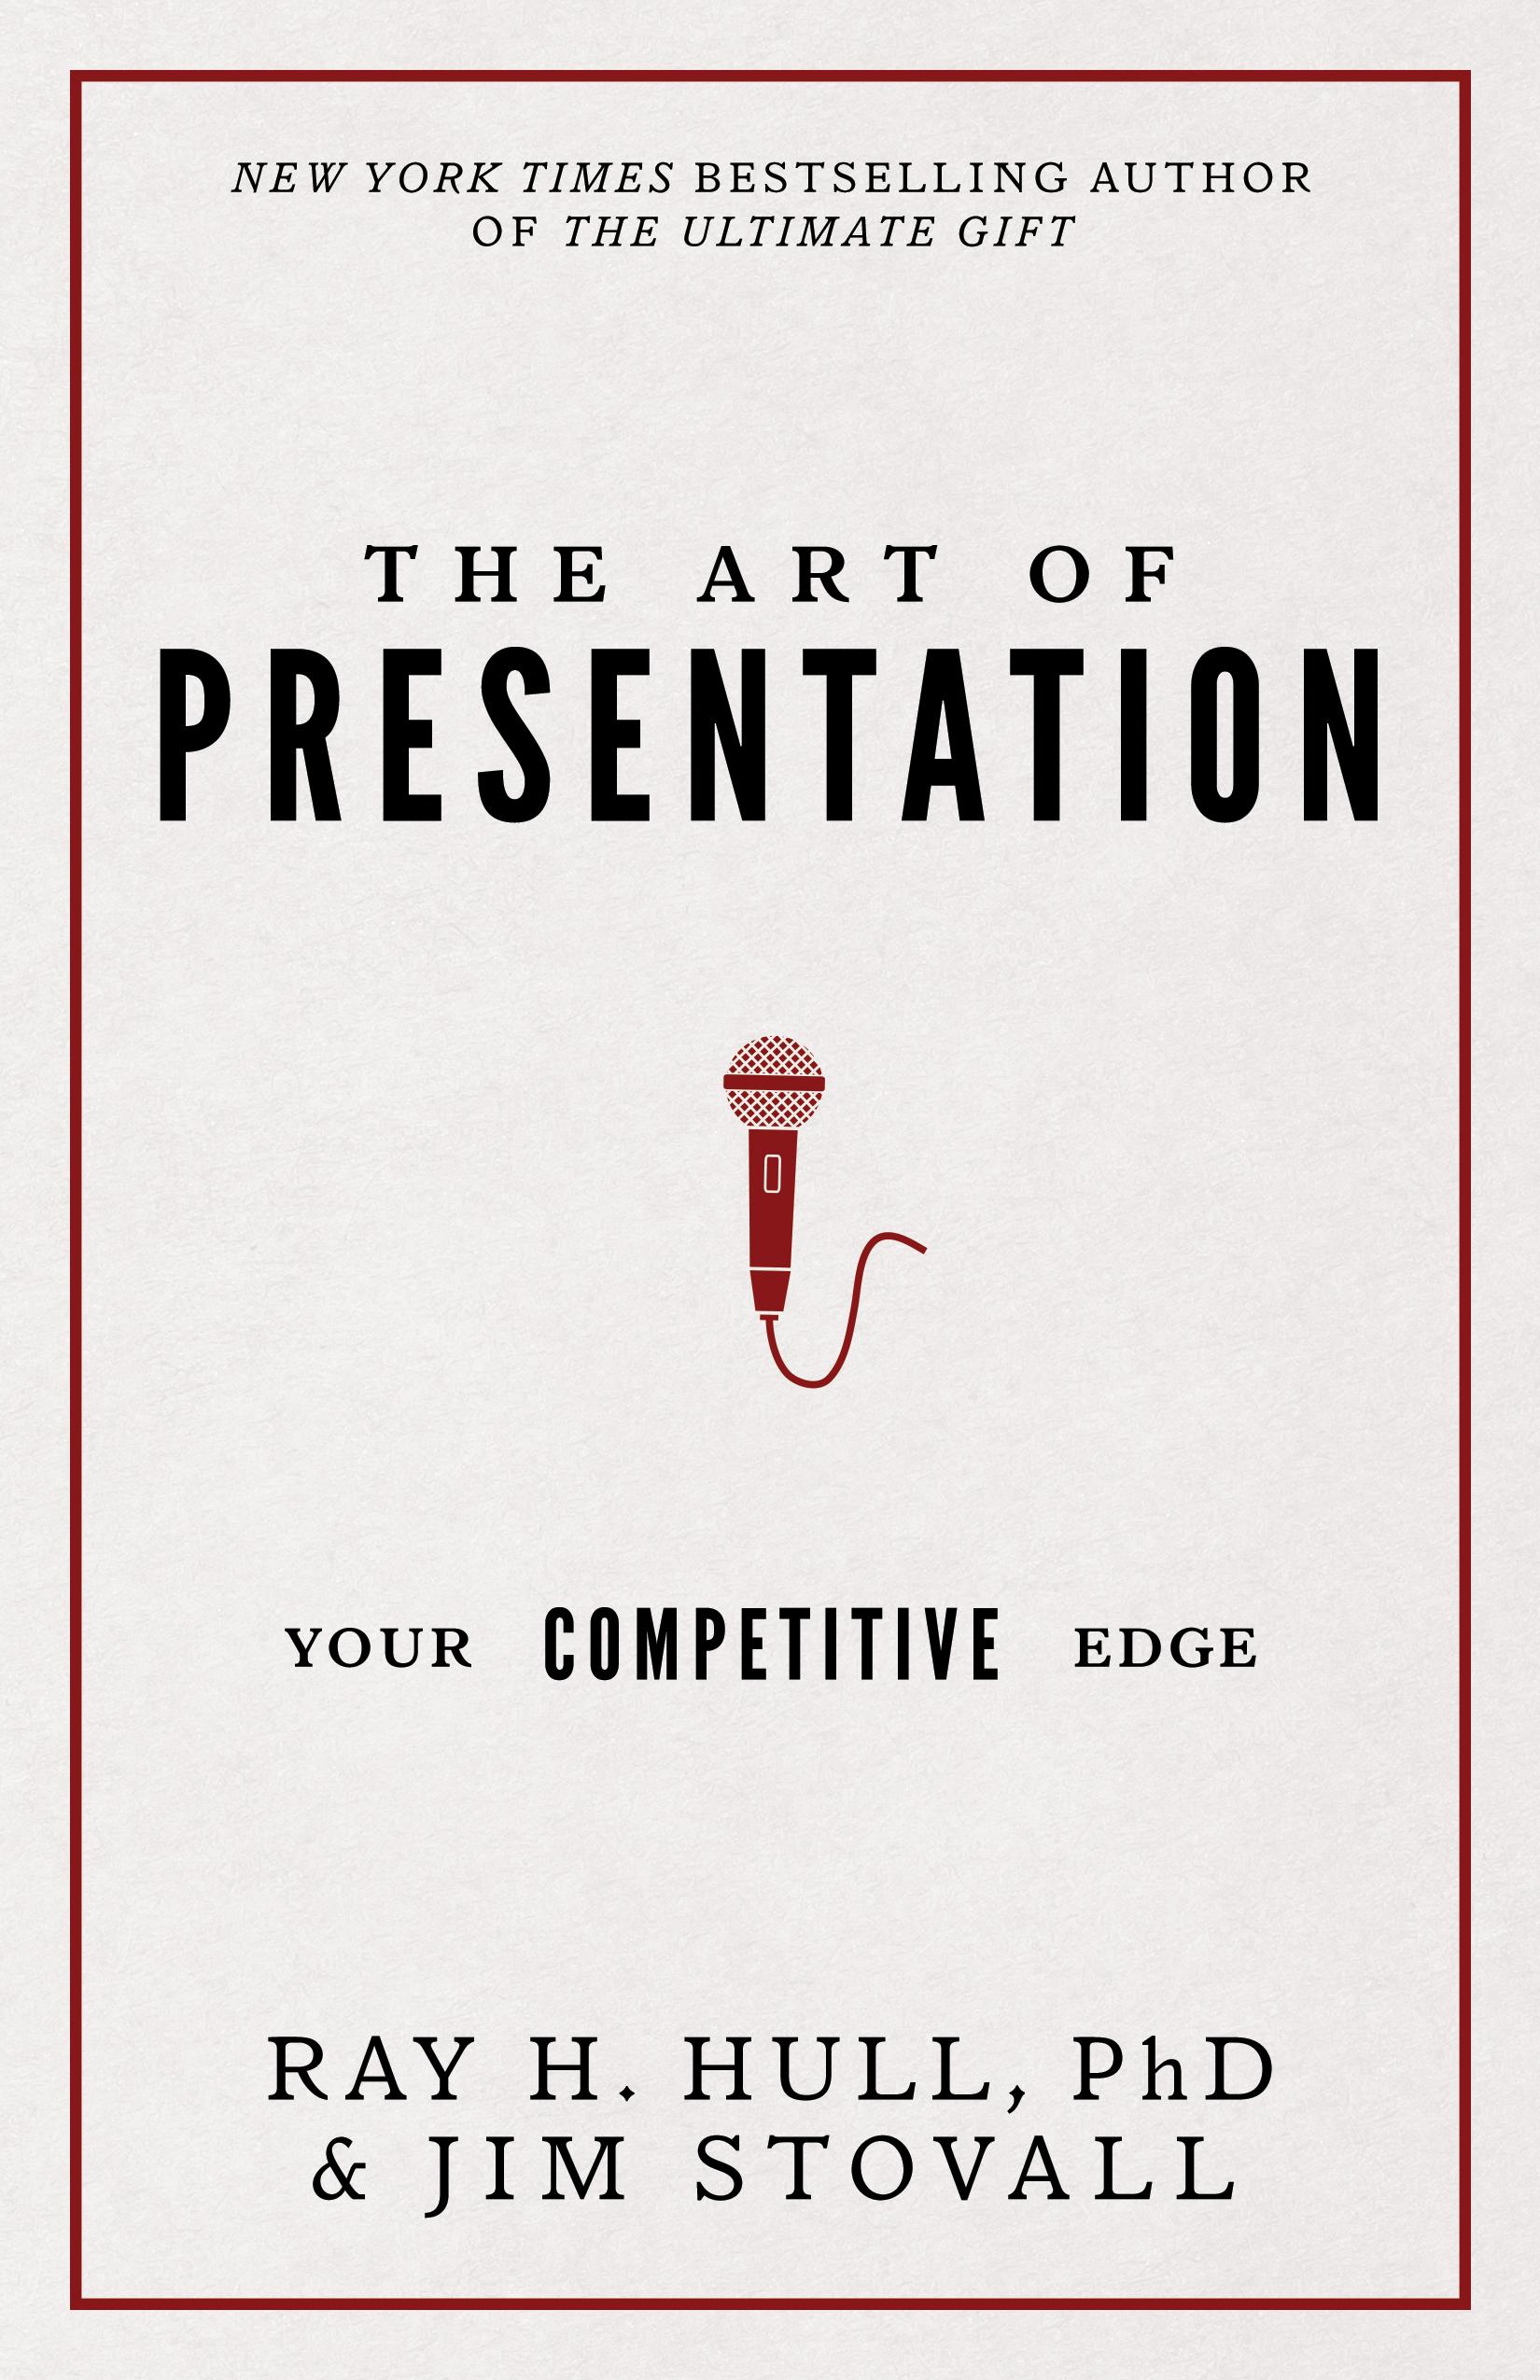 The Art of Presentation - Ray H. Hull, PHD and Jim Stovall